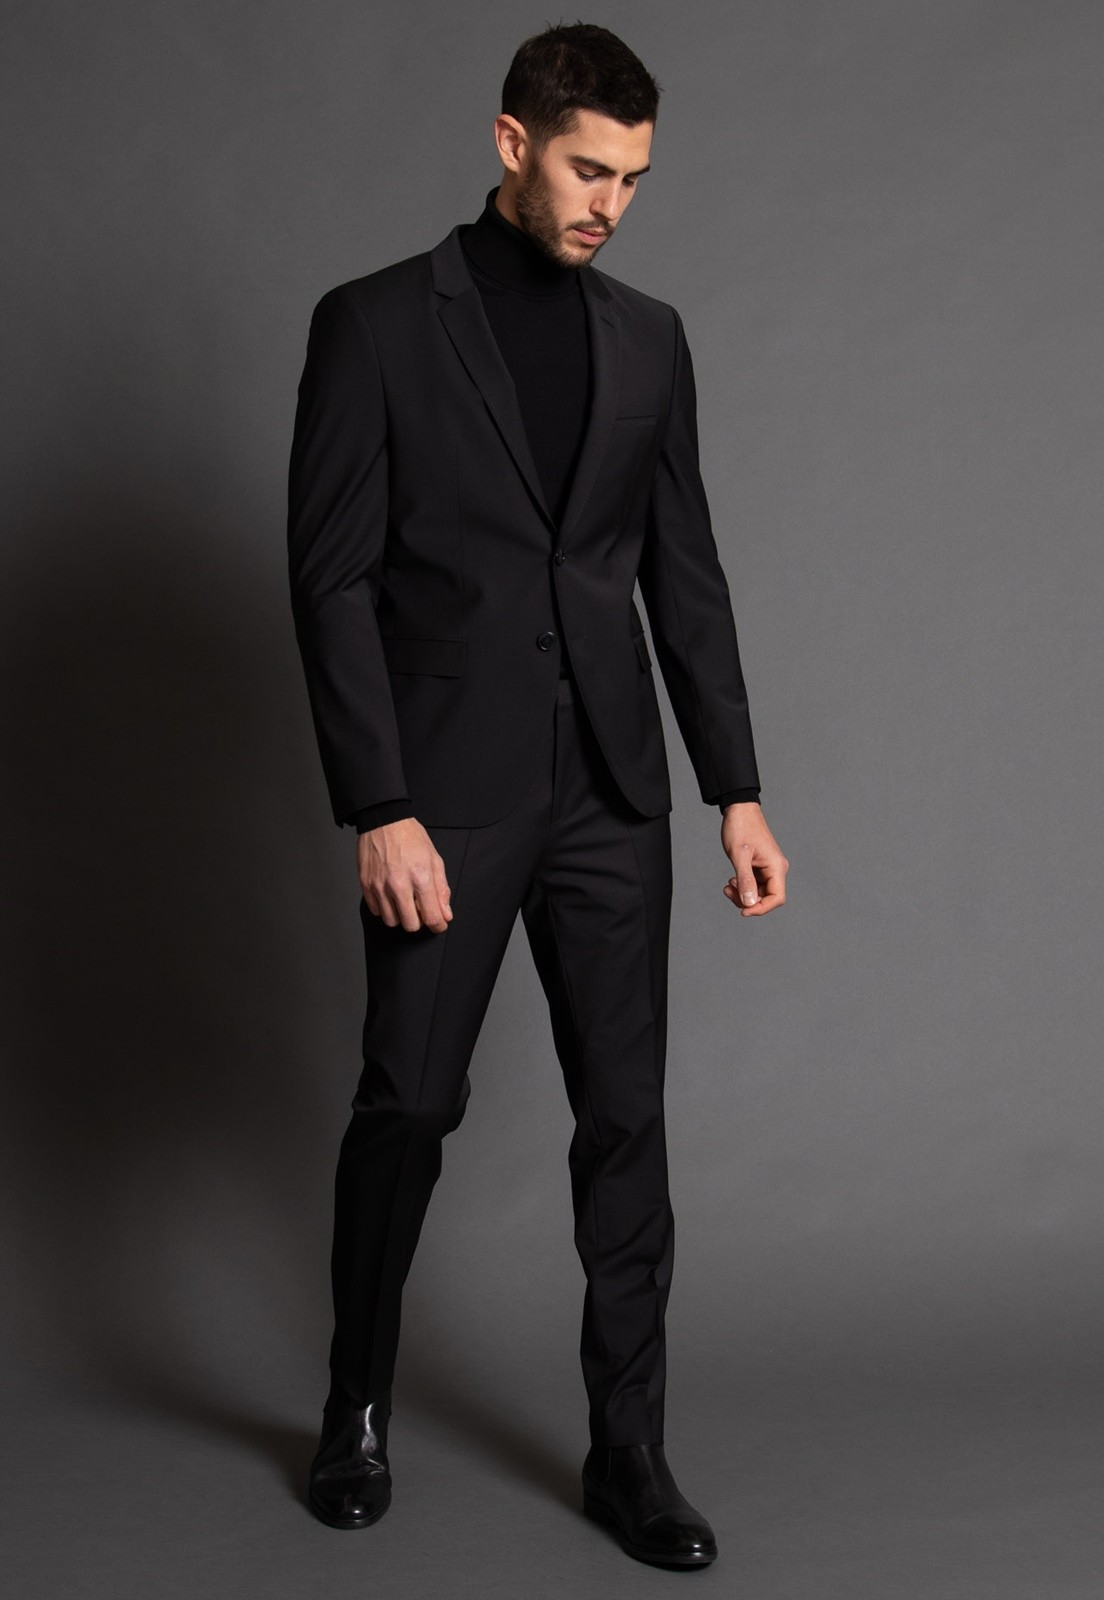 Terno Masculino Jordhan Slim Fit Preto Black Microfibra